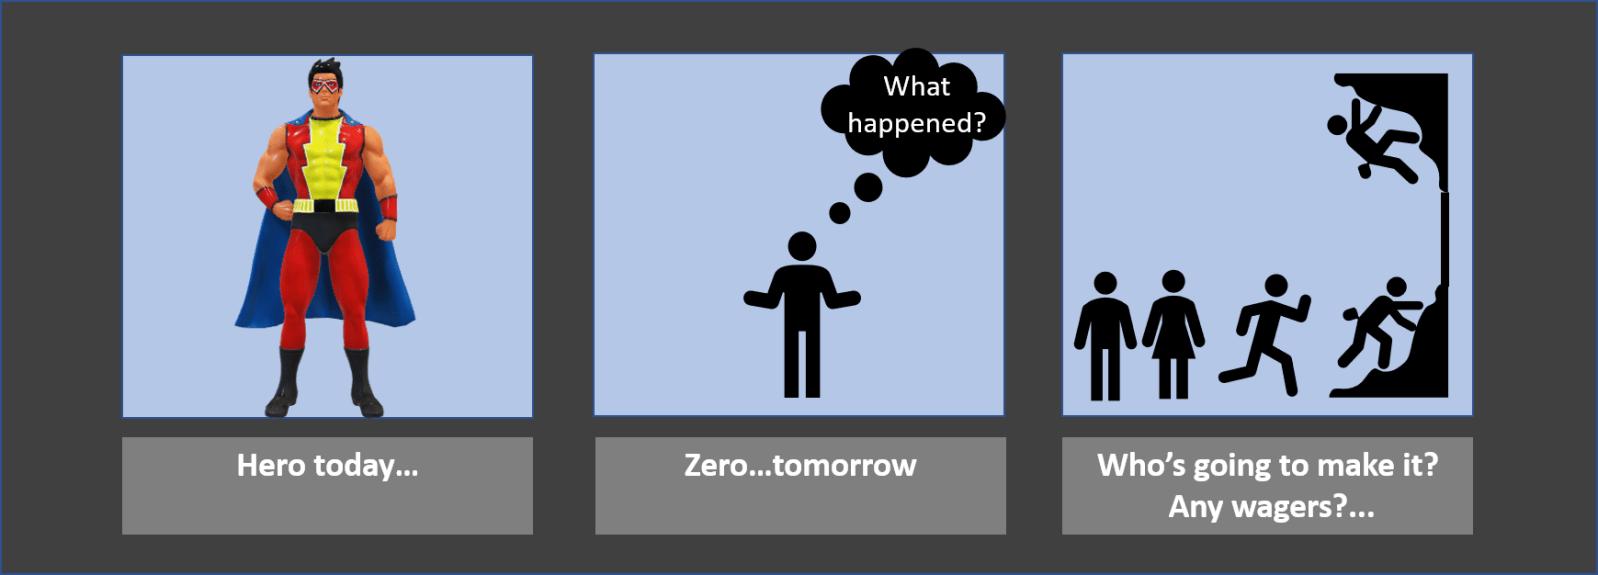 toxic workplace culture hero today zero tomorrow